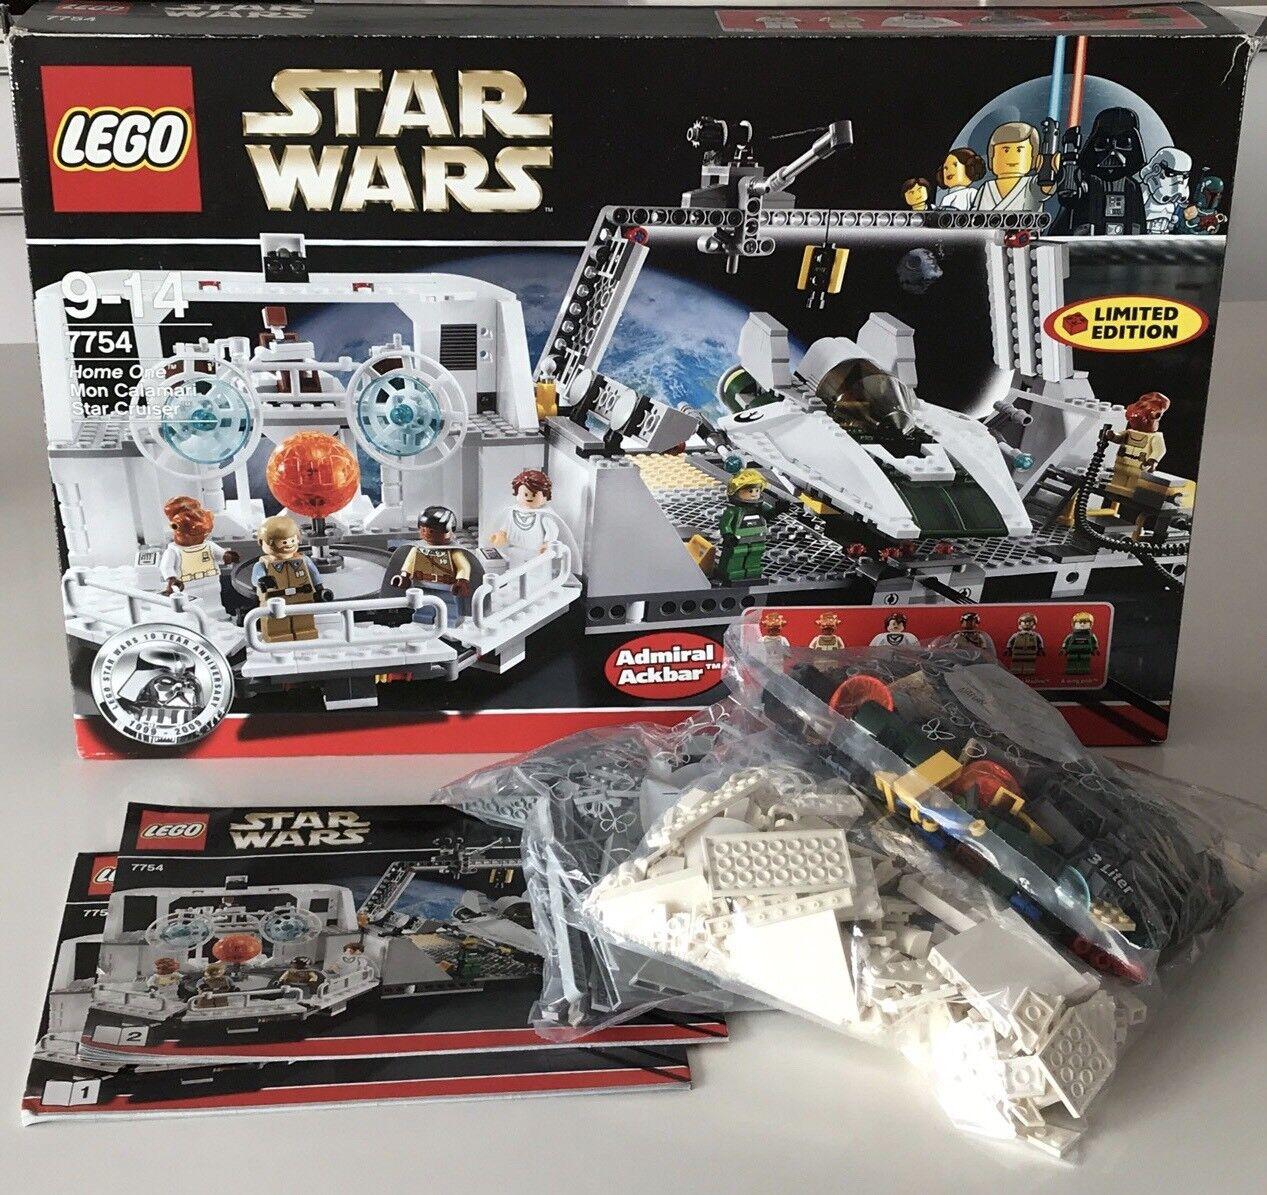 LEGO STAR WARS 7754 Home One Mon Calamari Star Star Star Cruiser Komplett + BA + OVP ebcb68